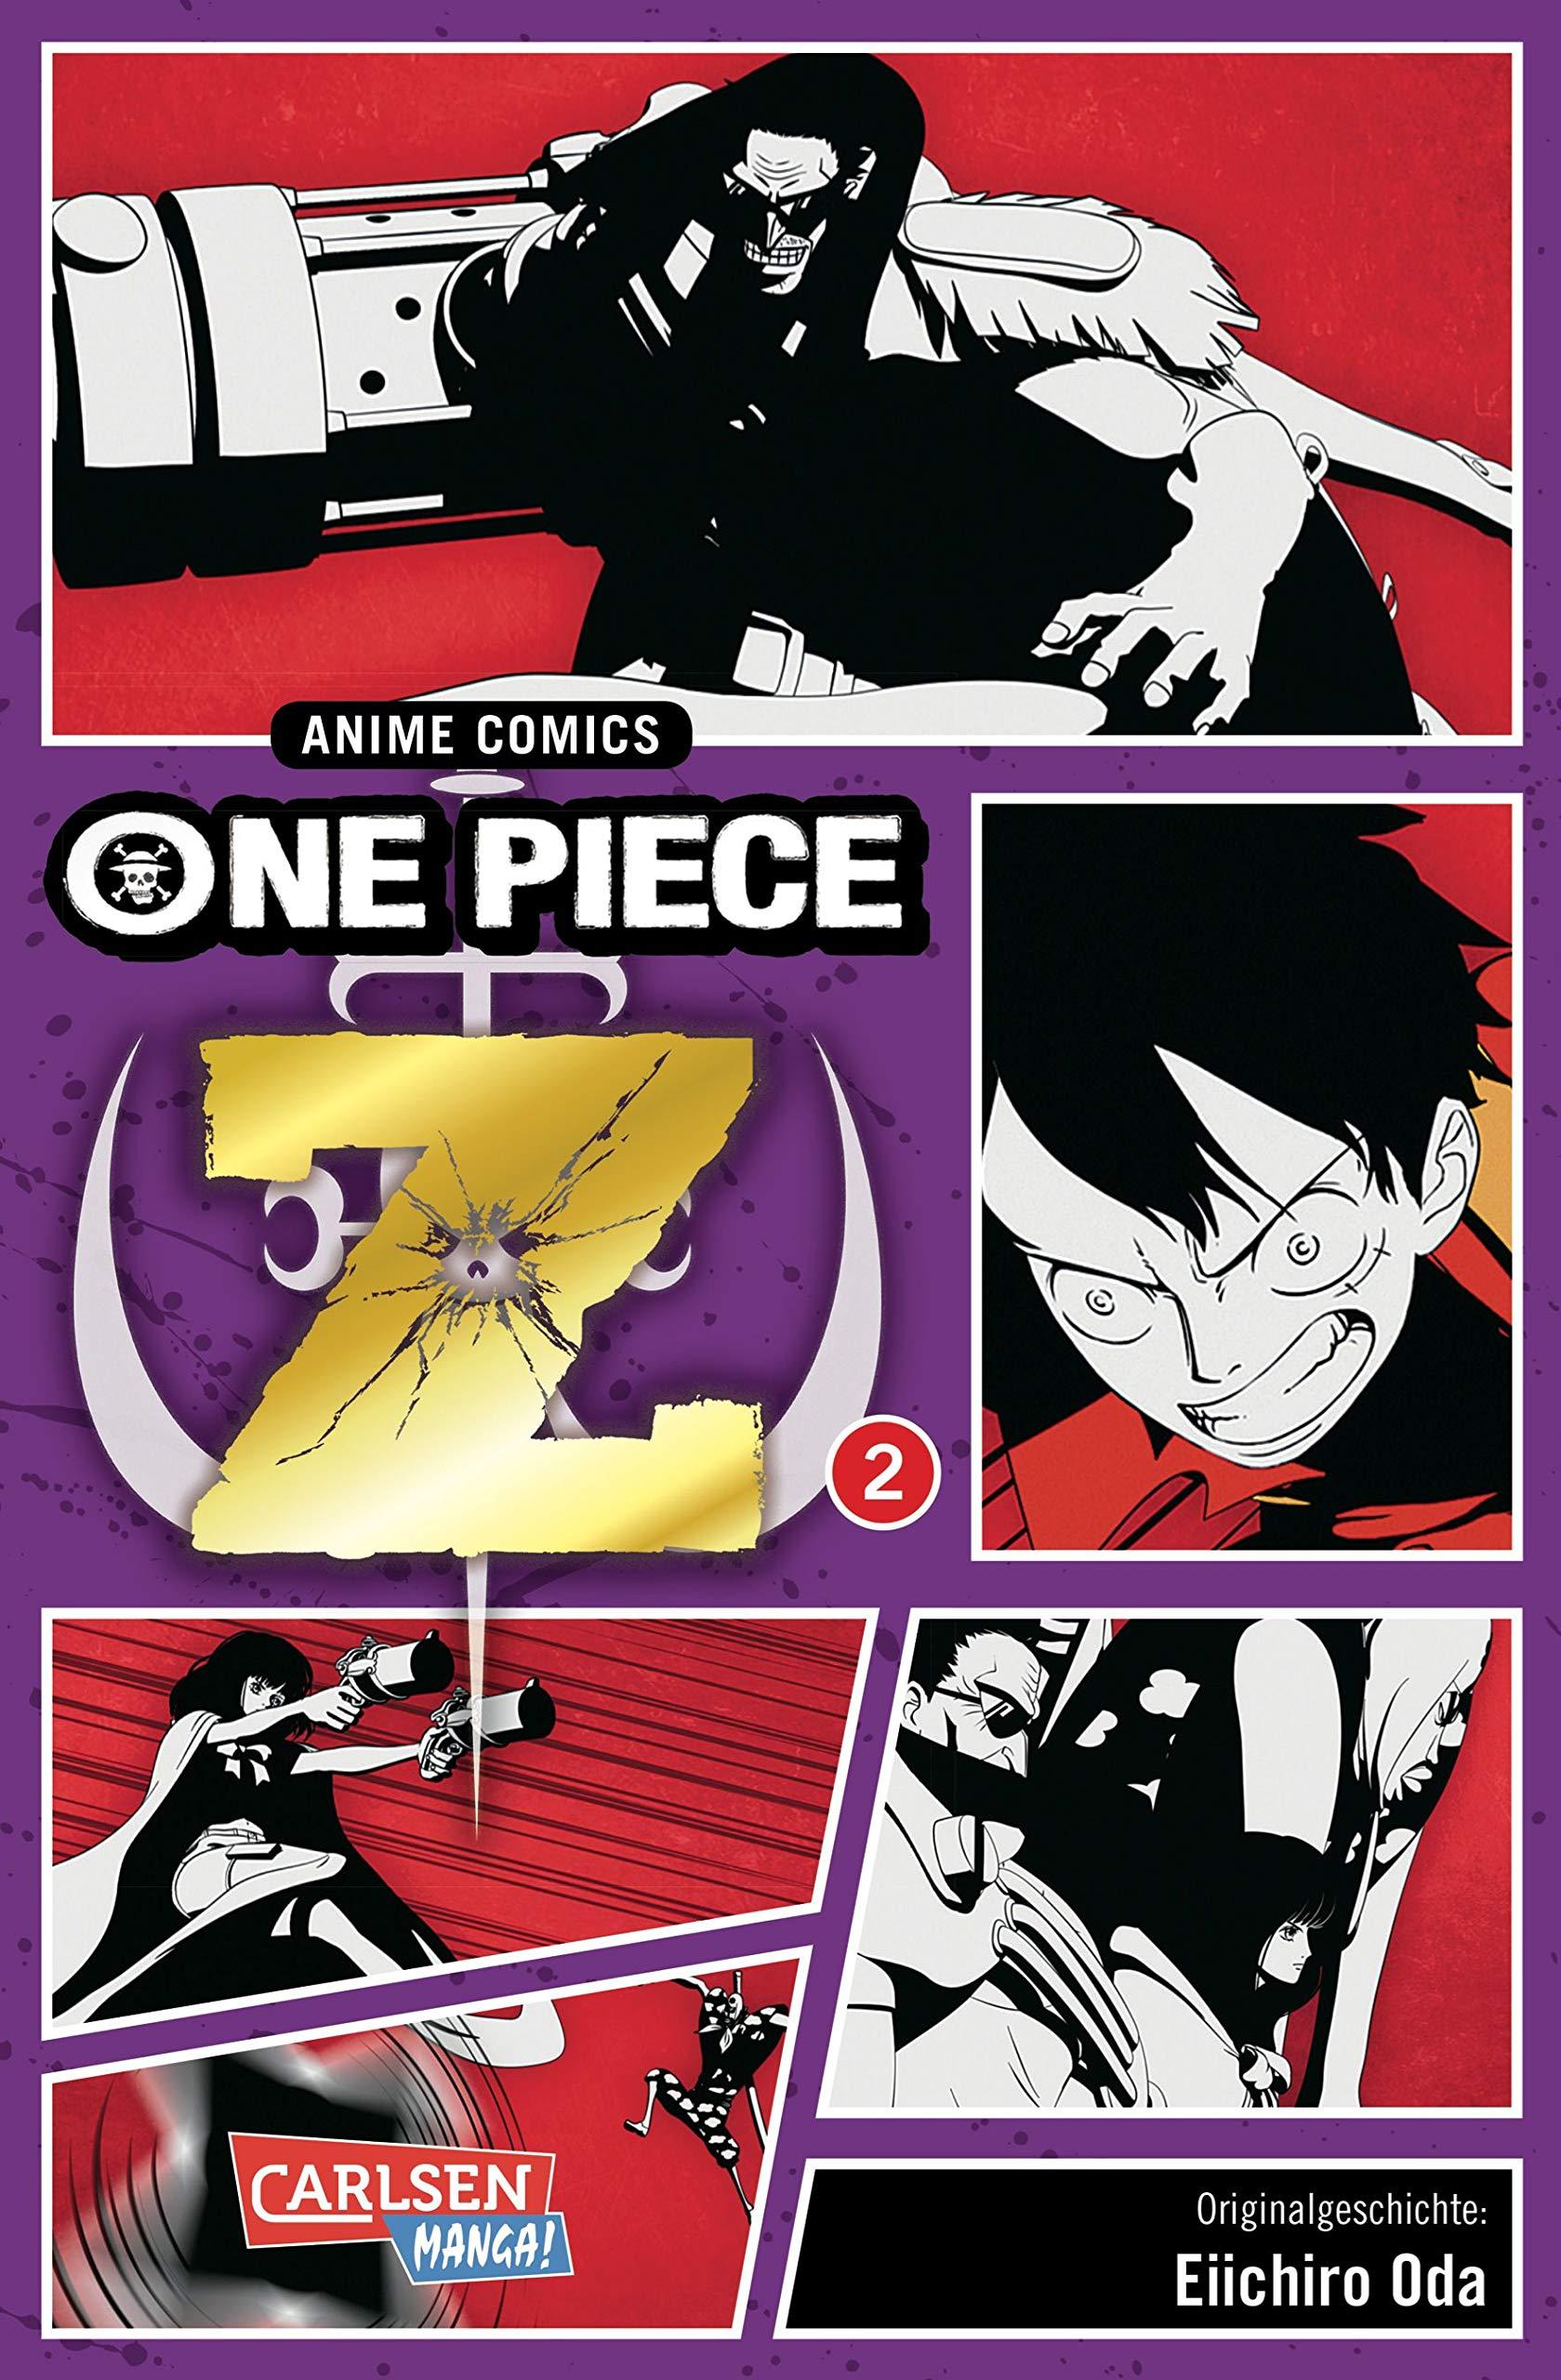 Manga – Star Comics – One Piece Z: Il FIlm – Anime Comics #2